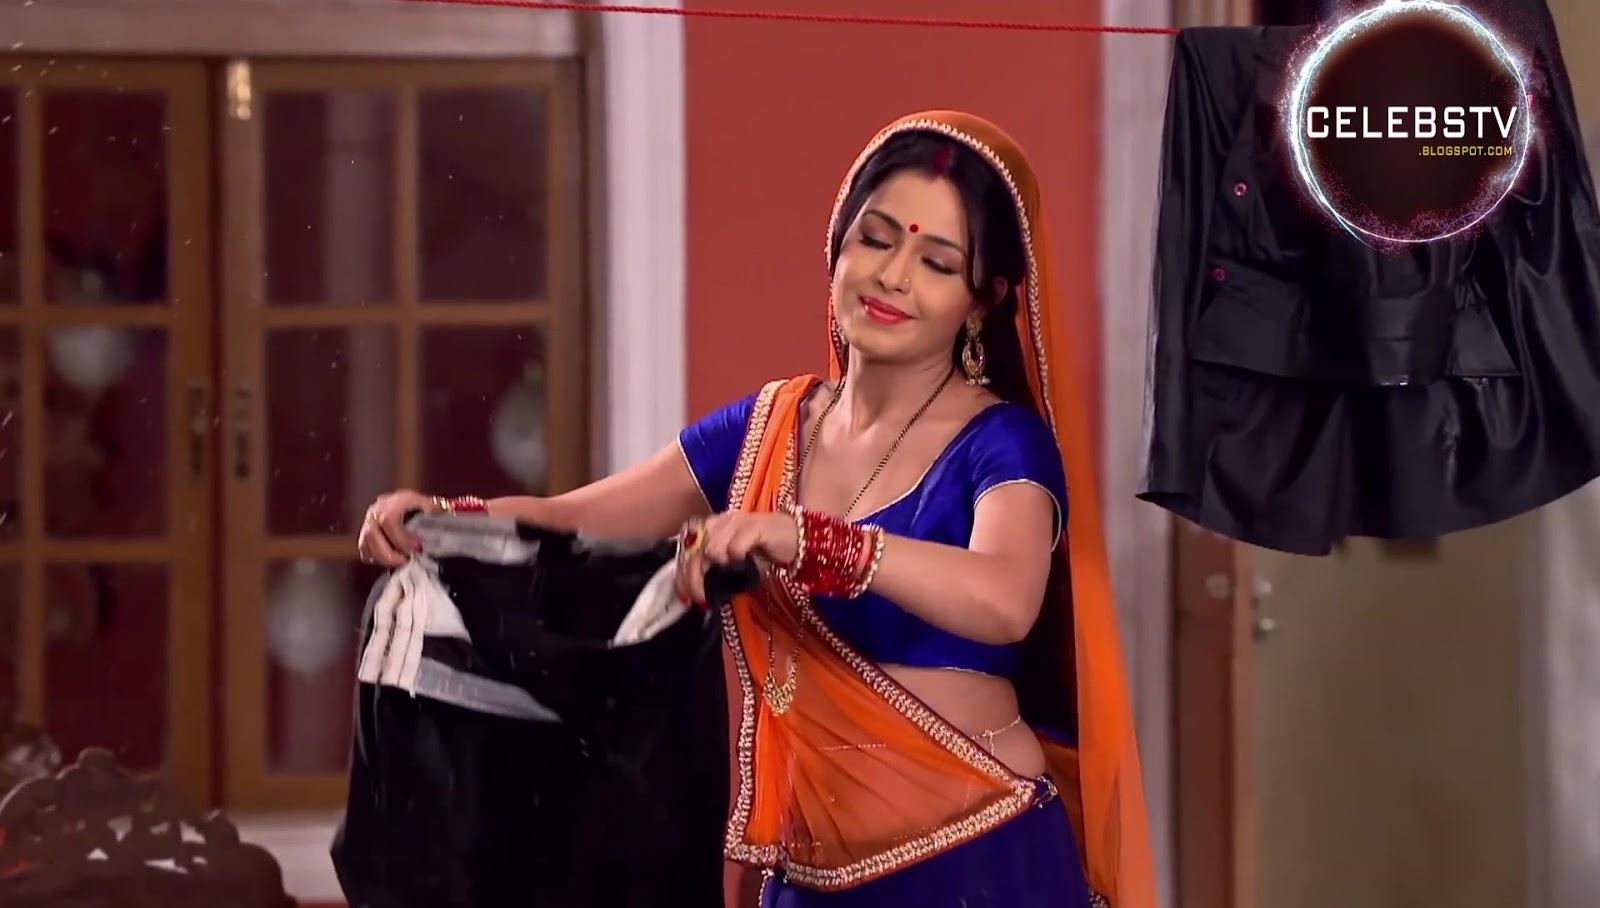 Shubhangi Atre Poorey Irresistible Sexy Navel and Cleavage Show - Sexy ... Taarak Mehta Ka Ooltah Chashmah Photos